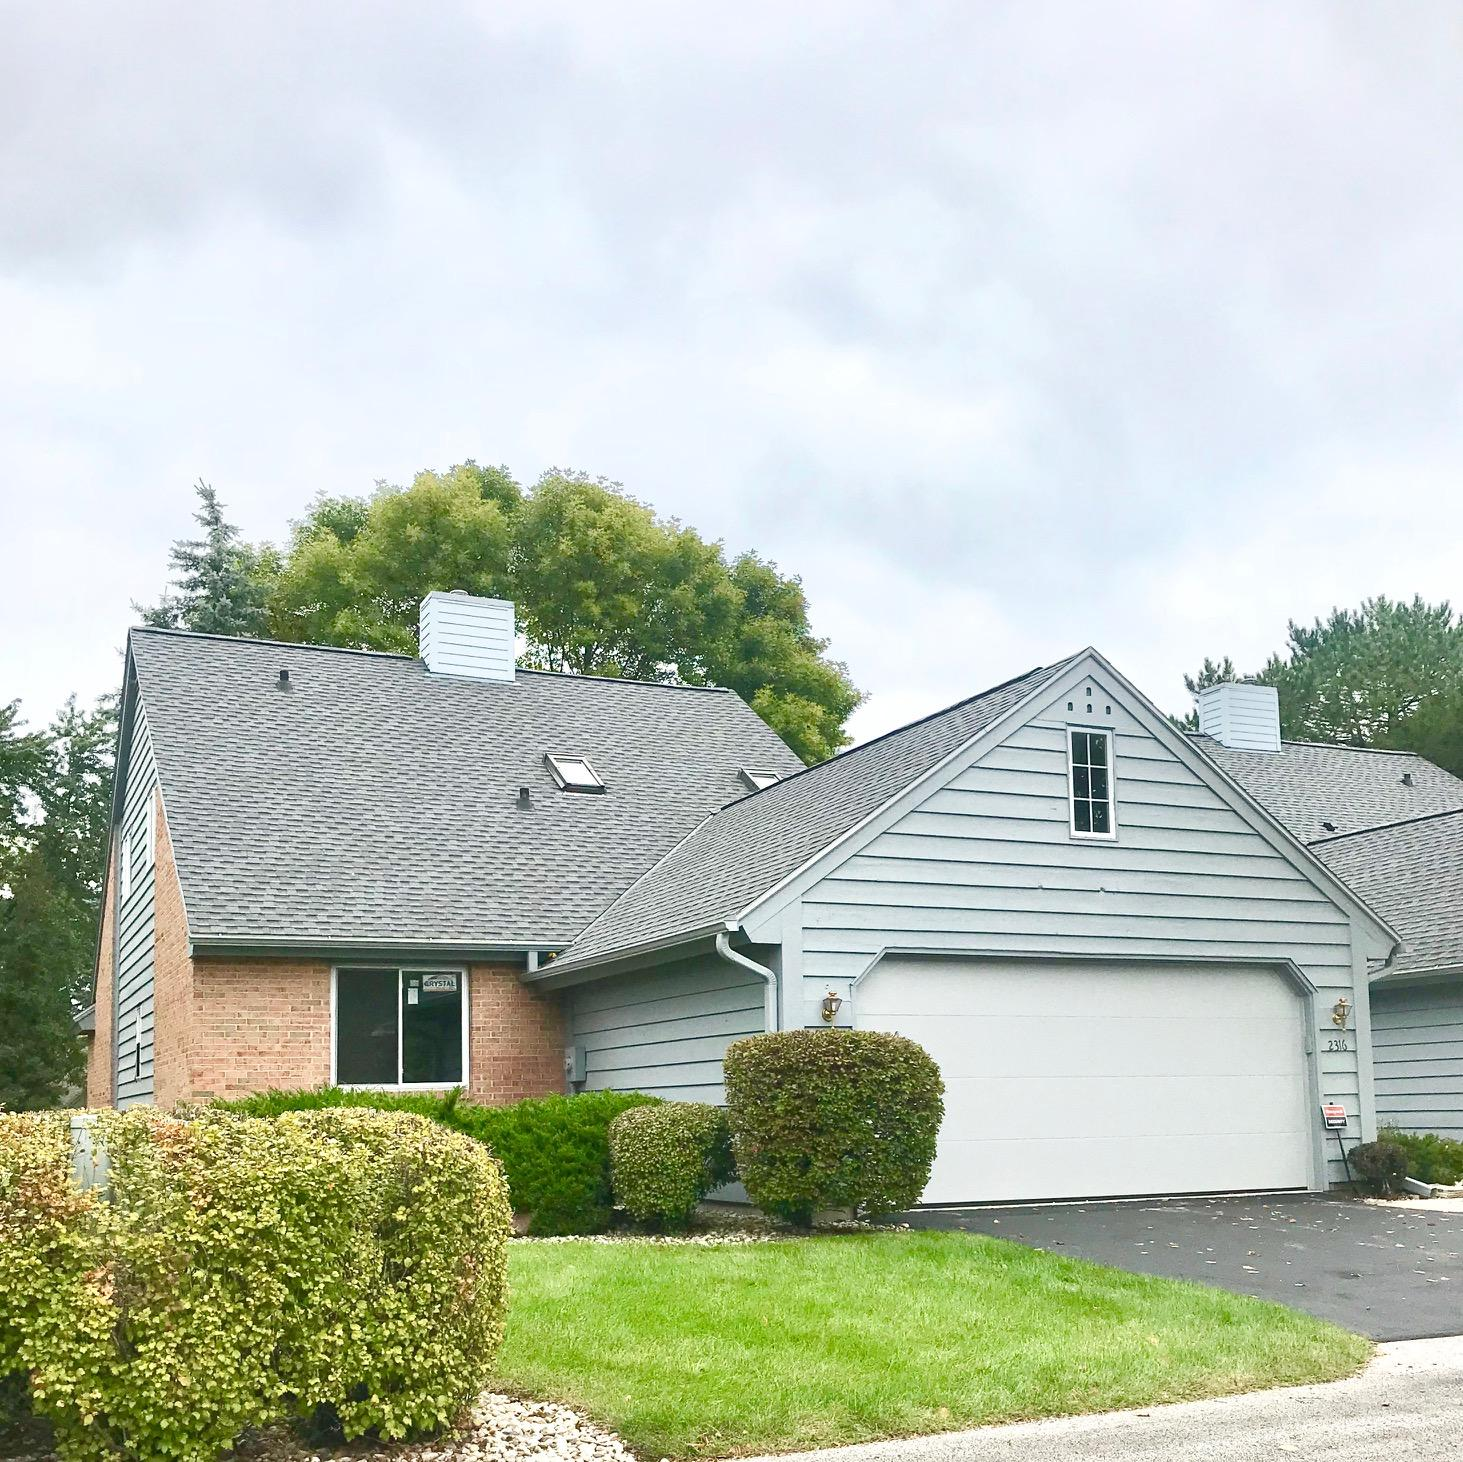 ... 2316 W Bancroft Ct Mequon, WI 53092 Property Image ...